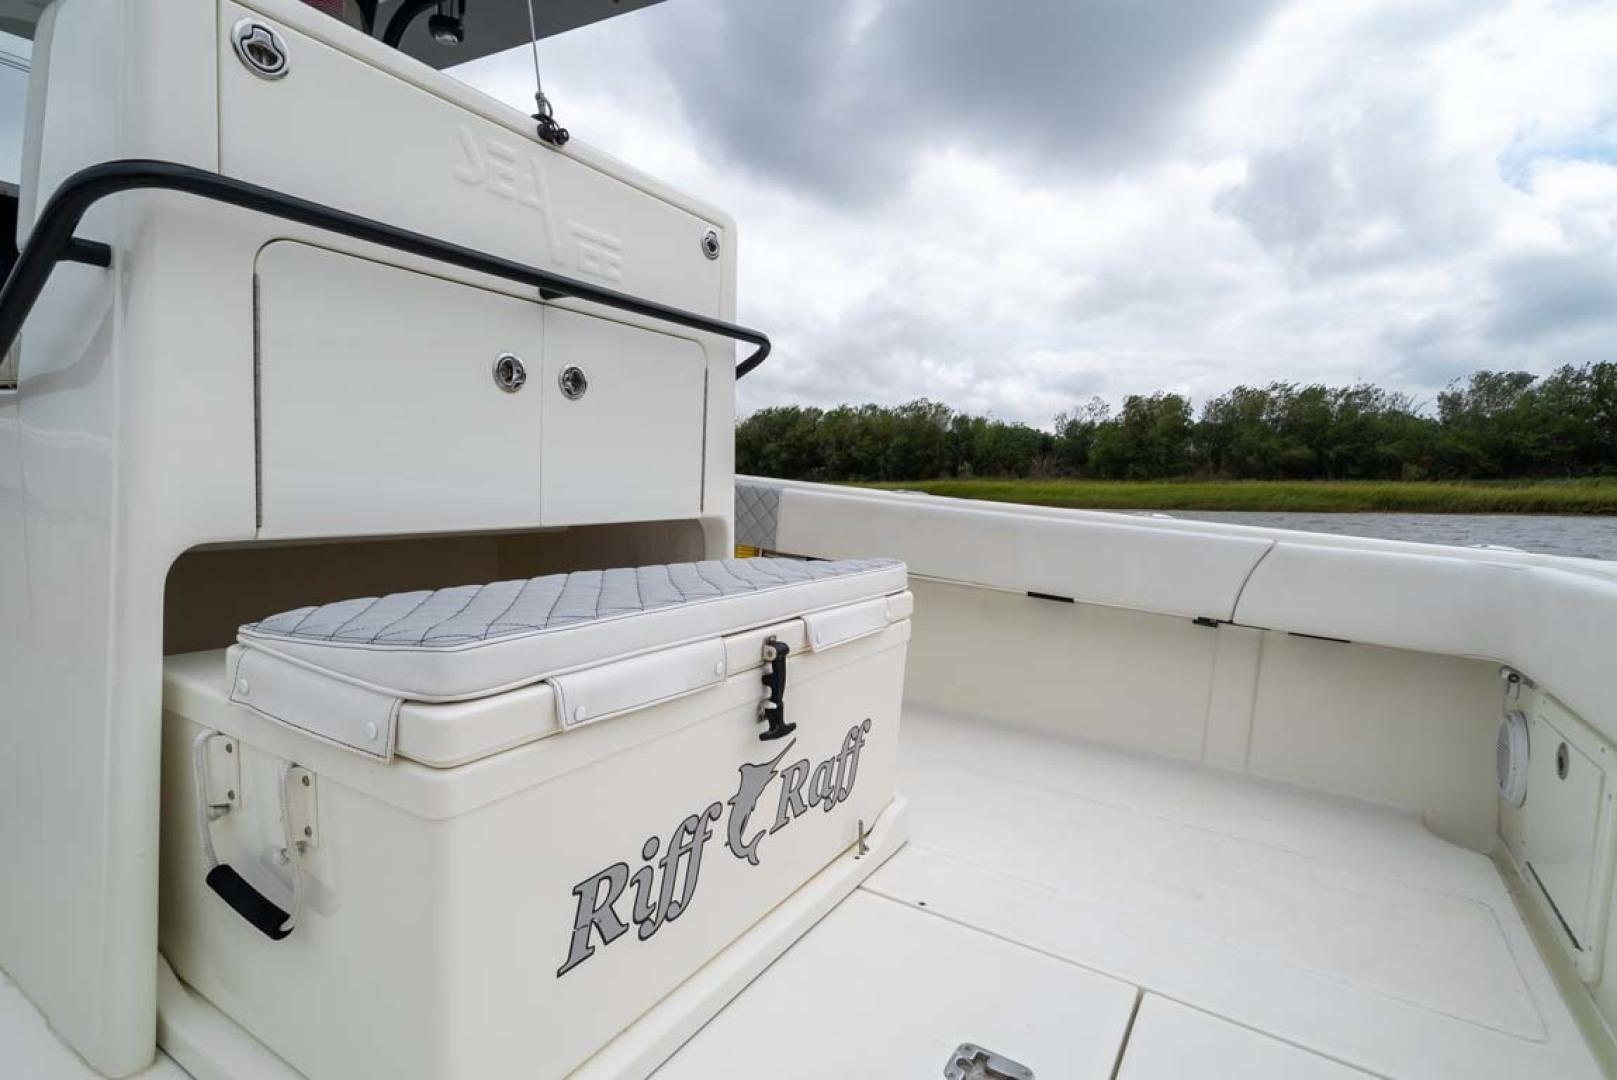 SeaVee-340 B Center Console 2014-Riff Raff Mount Pleasant-South Carolina-United States Cockpit-1509740 | Thumbnail